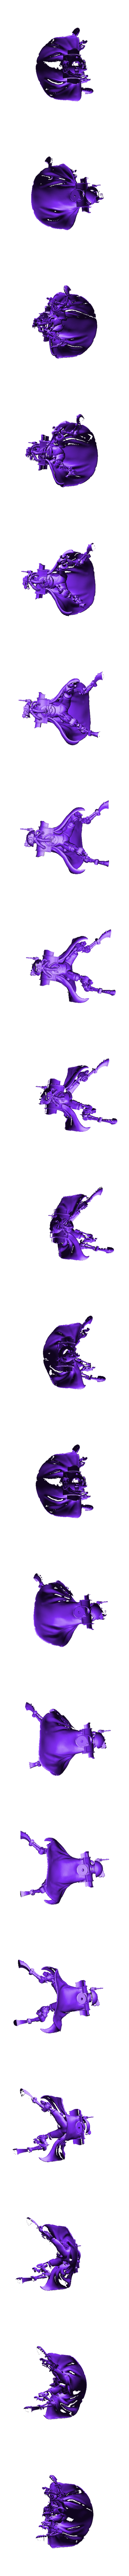 Princeps_body.stl Download free STL file Martian Leader of Stealthy Intruders • 3D printing template, ErikTheHeretek